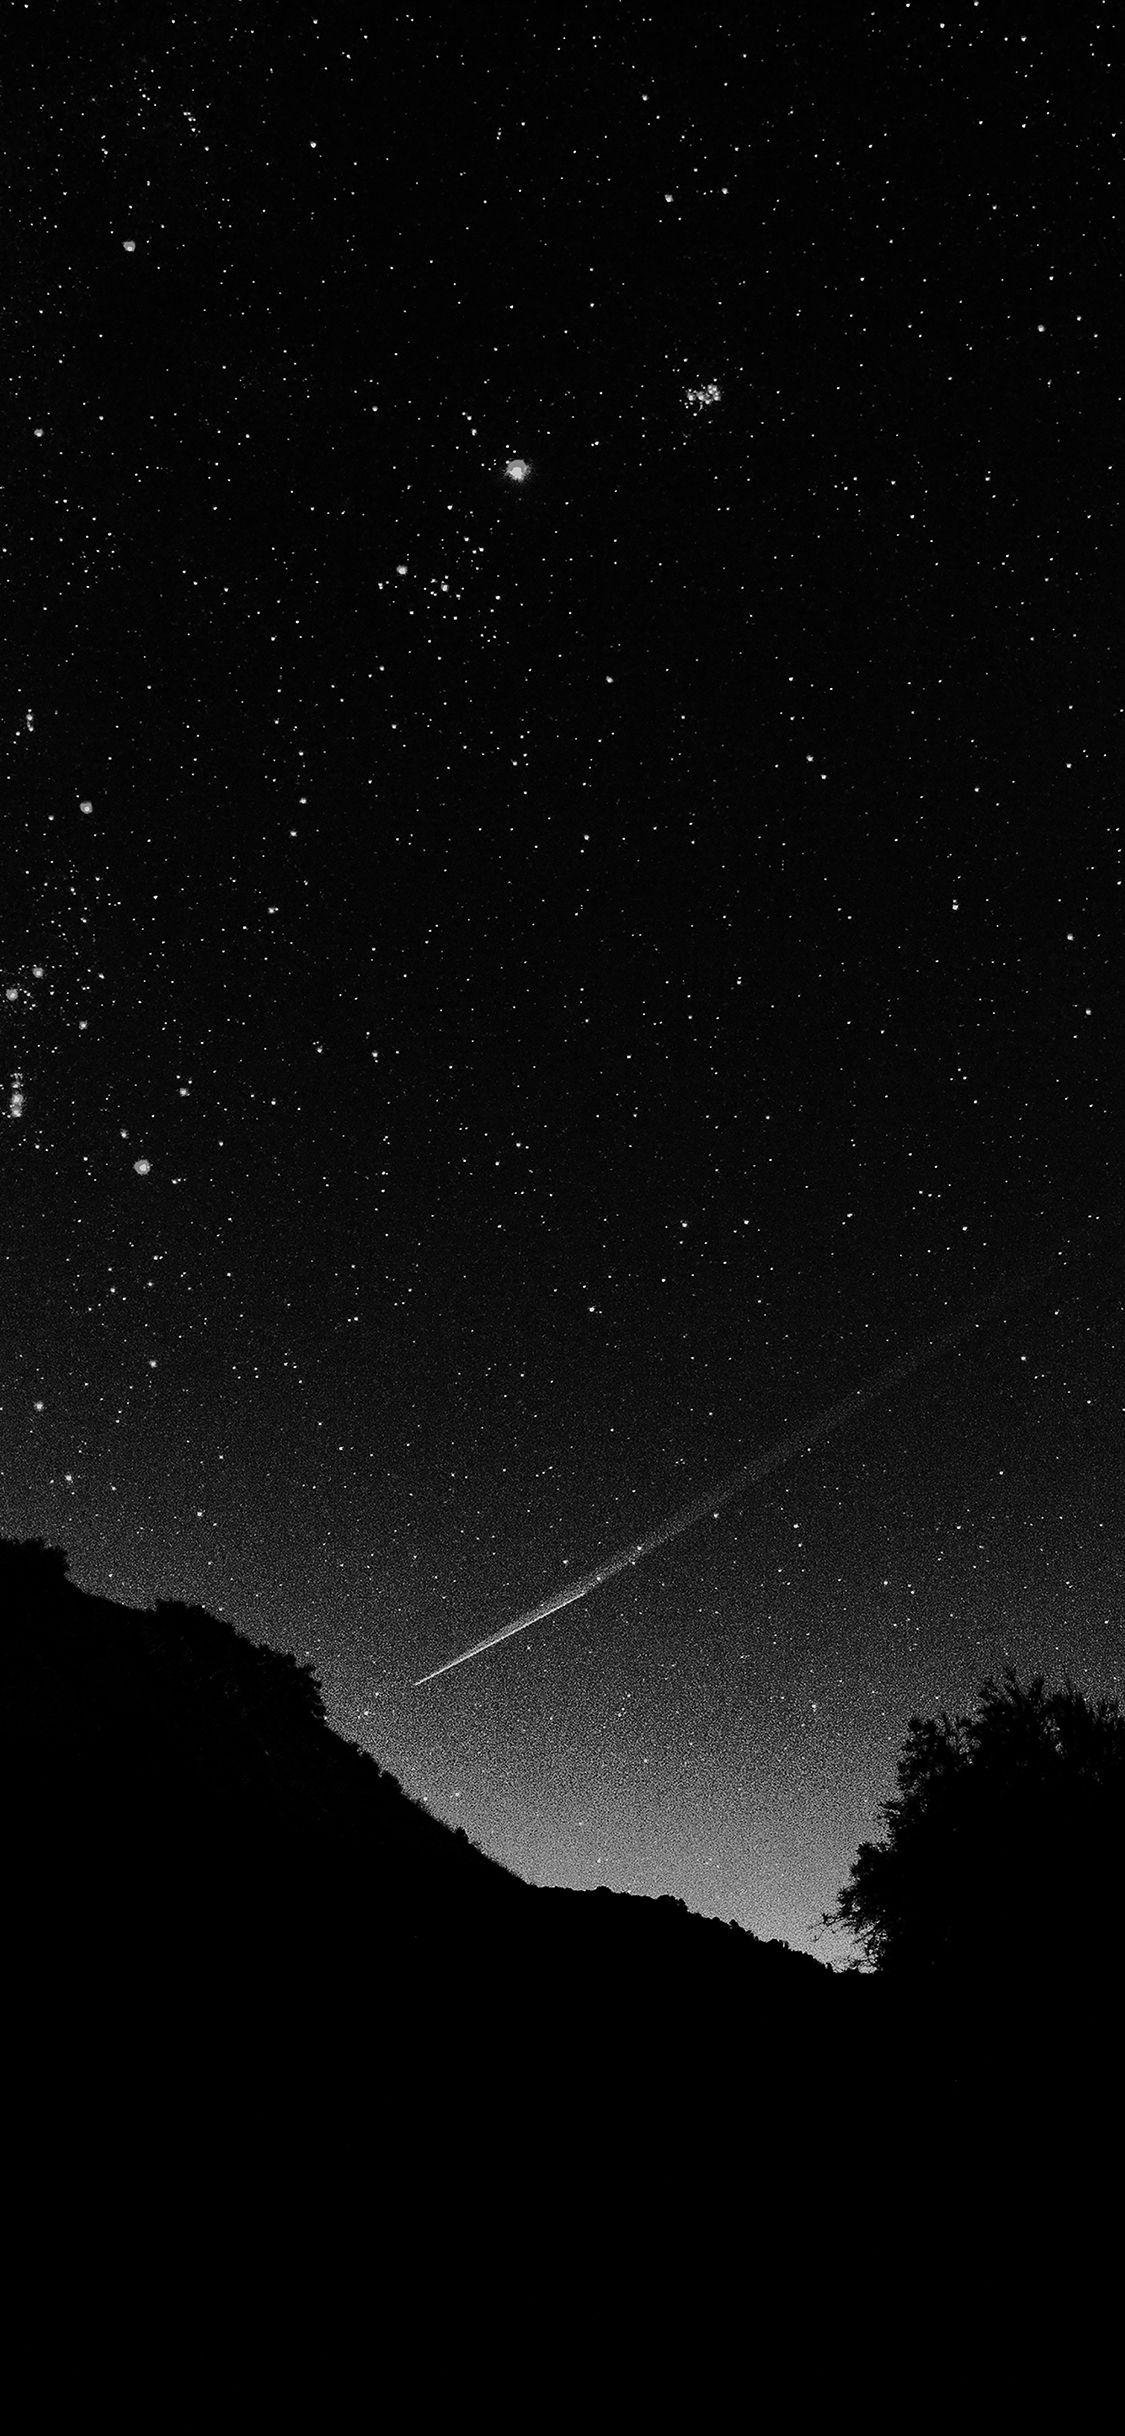 Mg37 Astronomy Space Black Sky Night Beautiful Falling Star Via Http Iphonexpapers Com Wallpapers For Ip Night Sky Wallpaper Black Wallpaper Dark Wallpaper